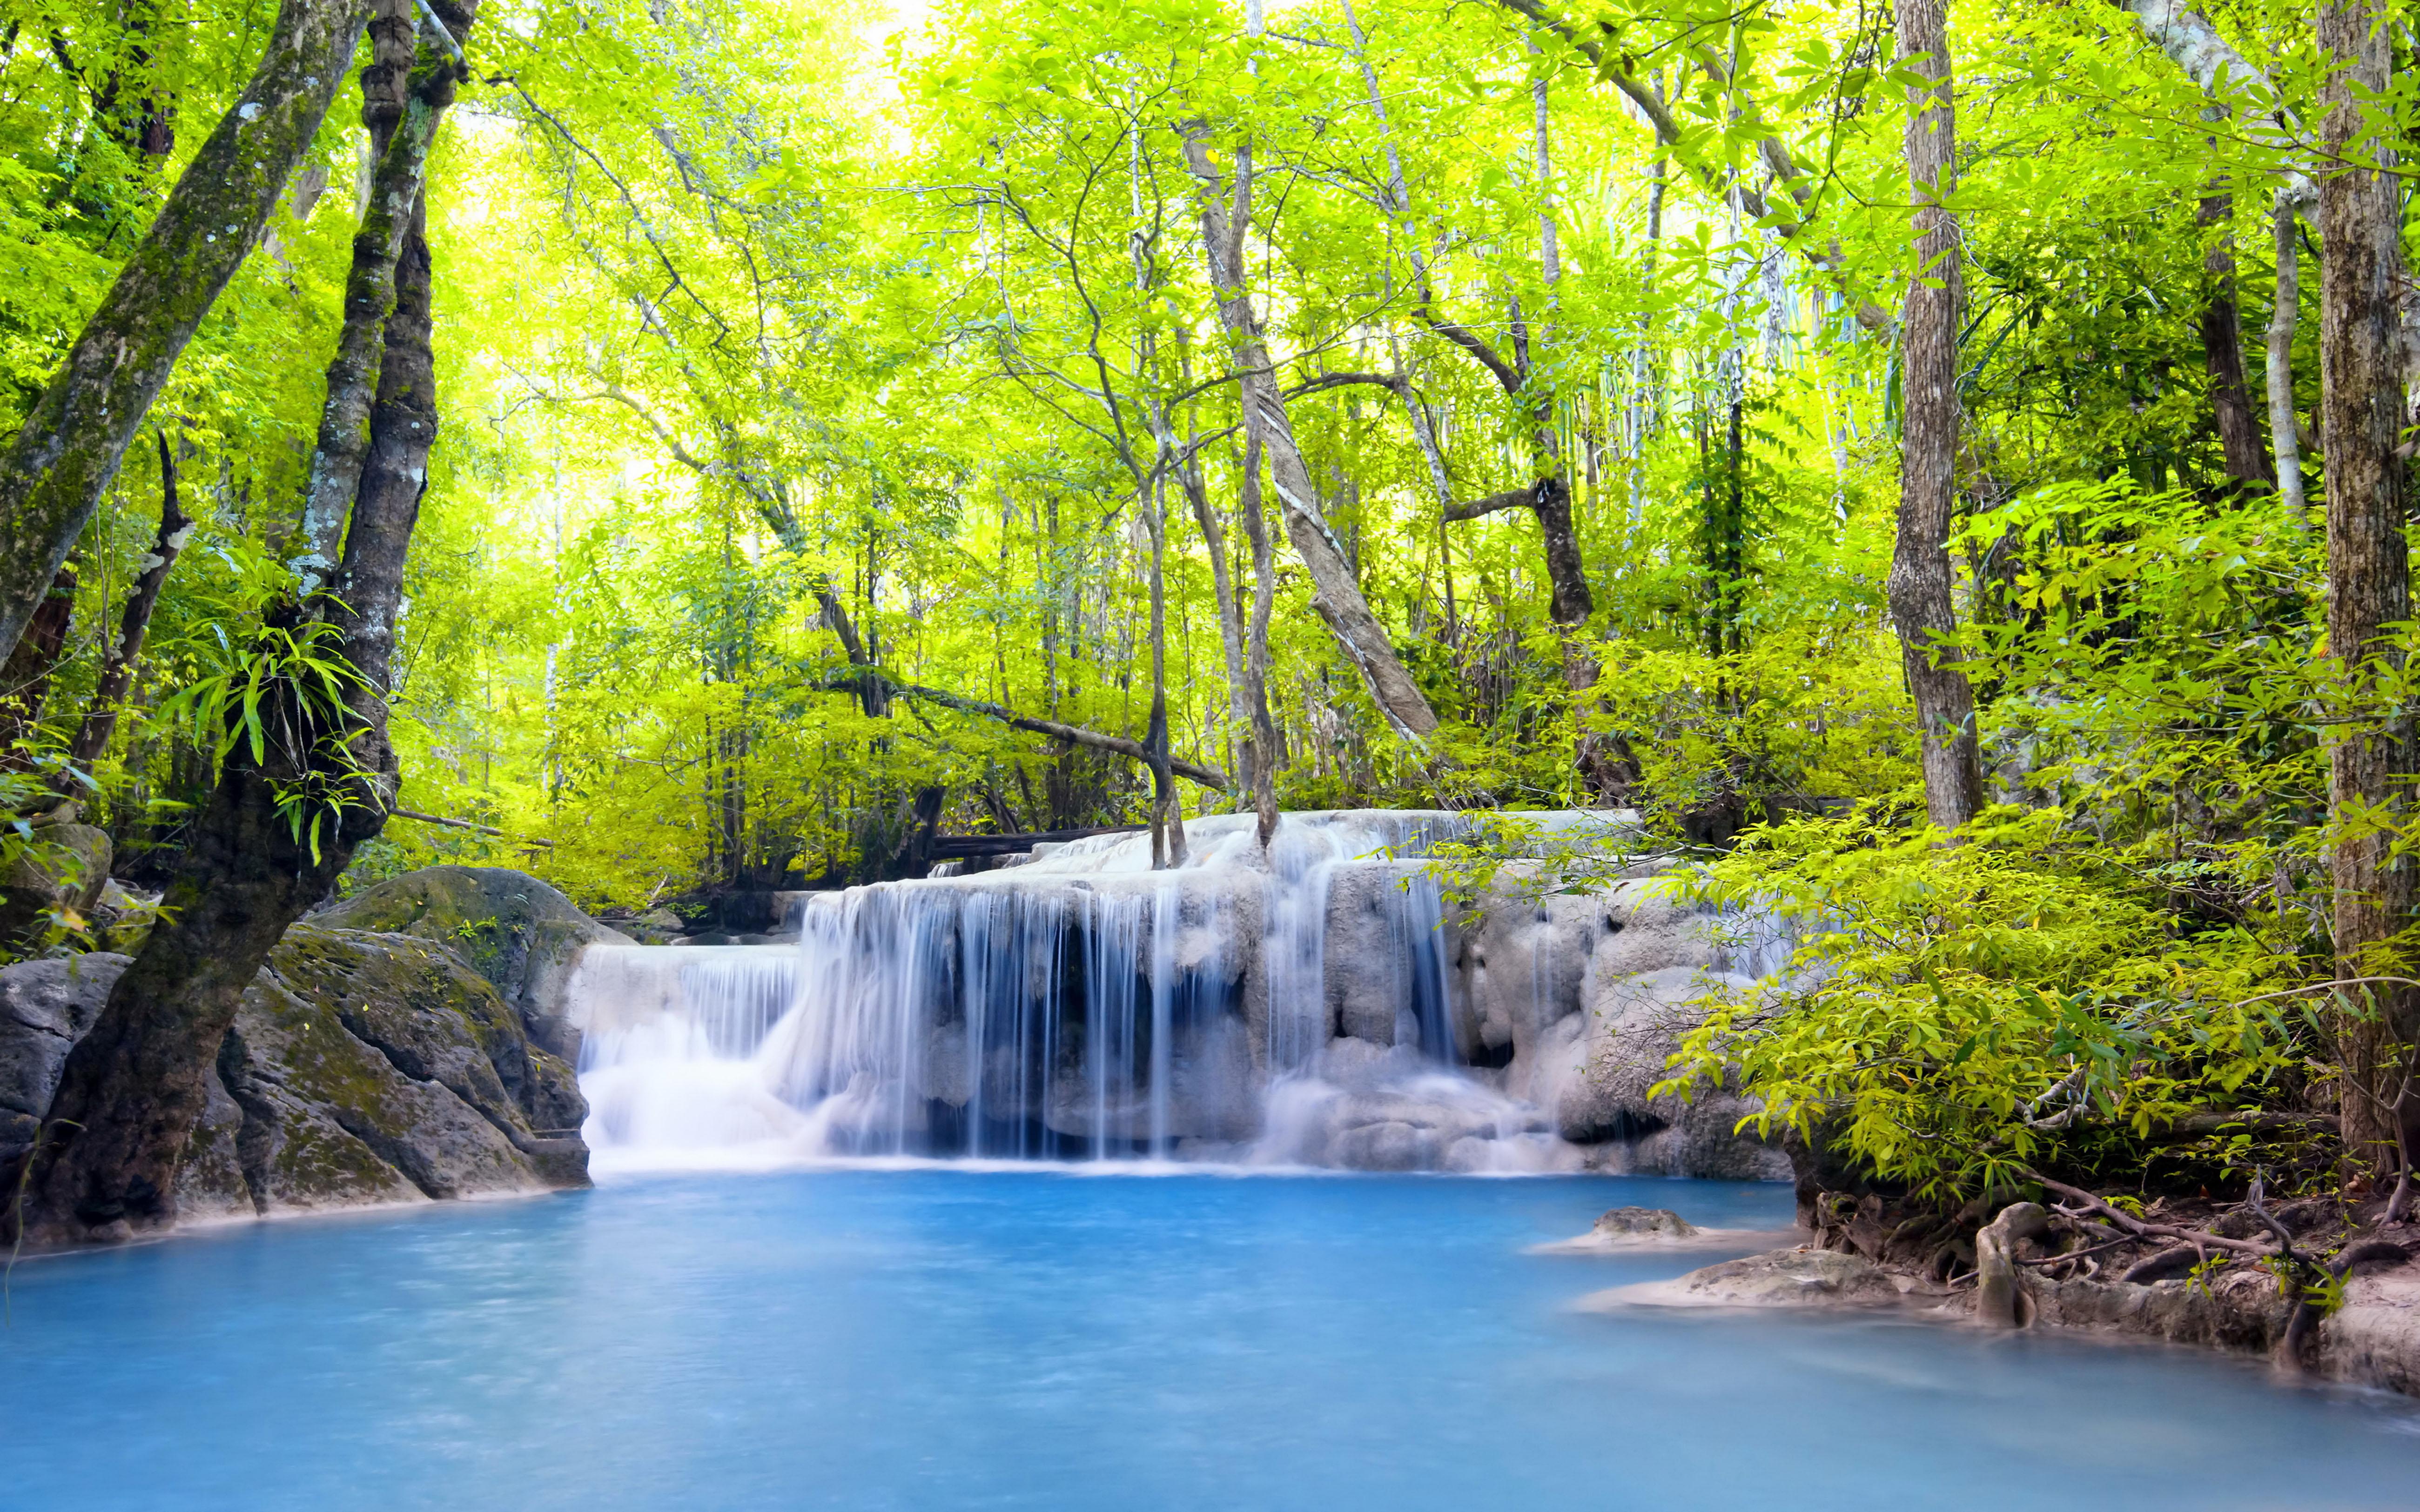 Kuang Si Falls Hd Wallpaper Beautiful Nature Erawan Waterfall In Thailand Hd Wallpaper